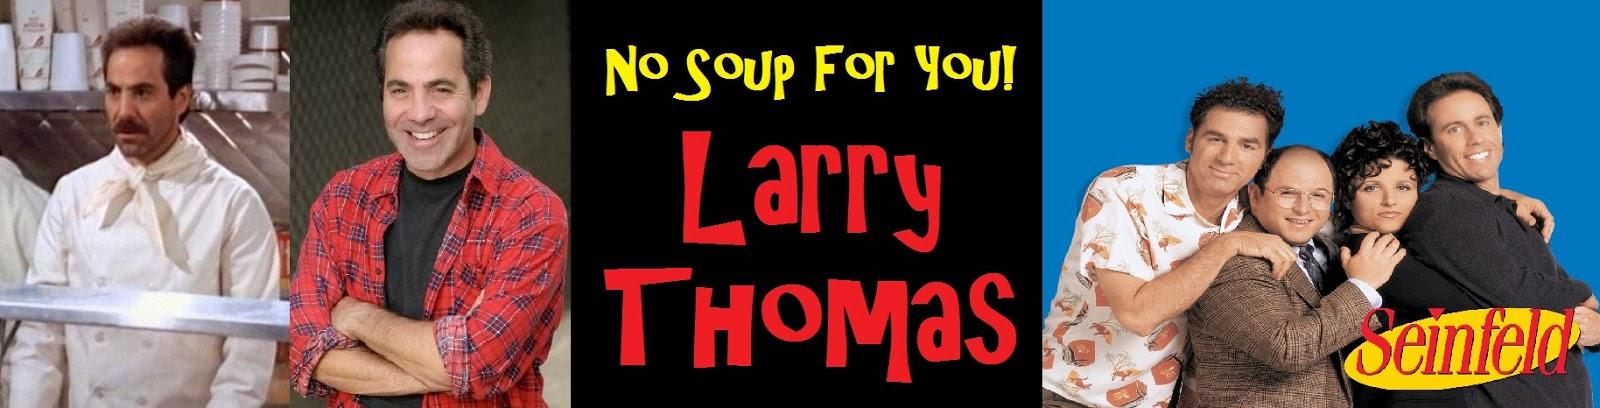 Larry Thomas Soup Nazi, Seinfeld Soup Nazi